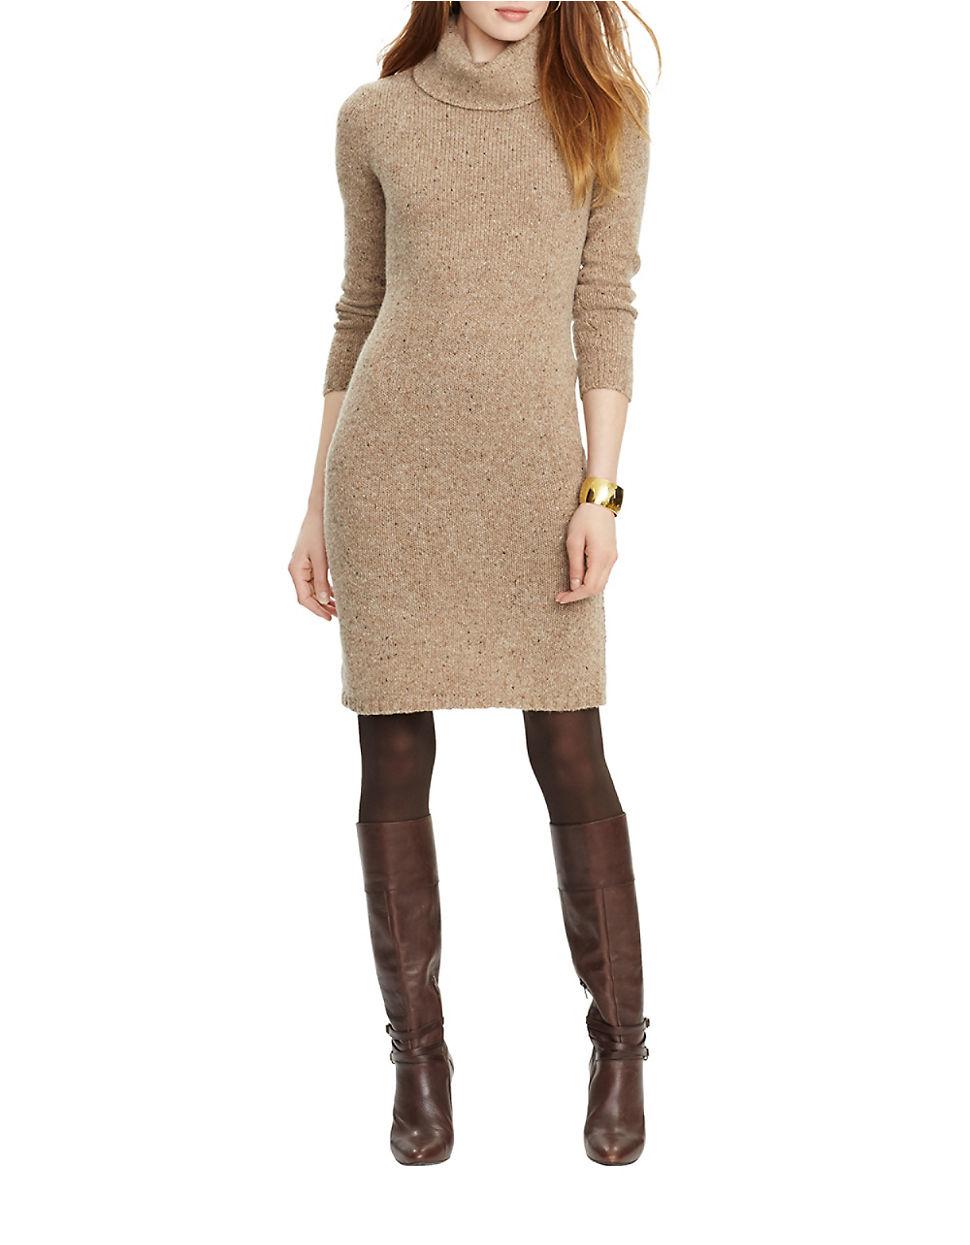 3f0026b80ed8 Lauren By Ralph Lauren Petite Turtleneck Sweater Dress in Natural - Lyst